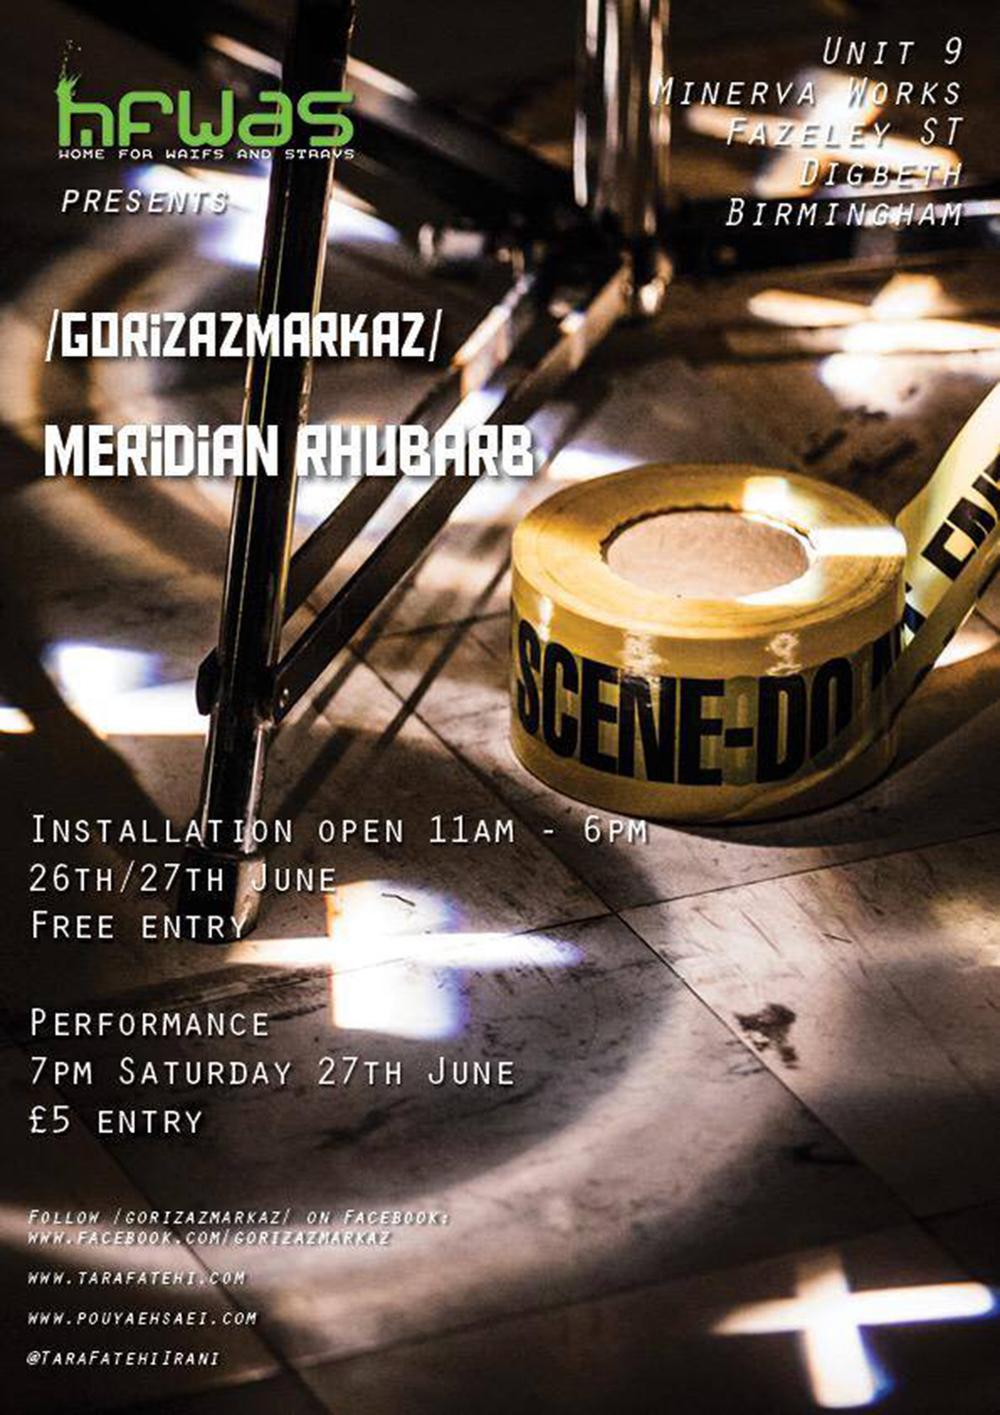 /gorizazmarkaz/|Meridian Rhubarb    Poster   2015